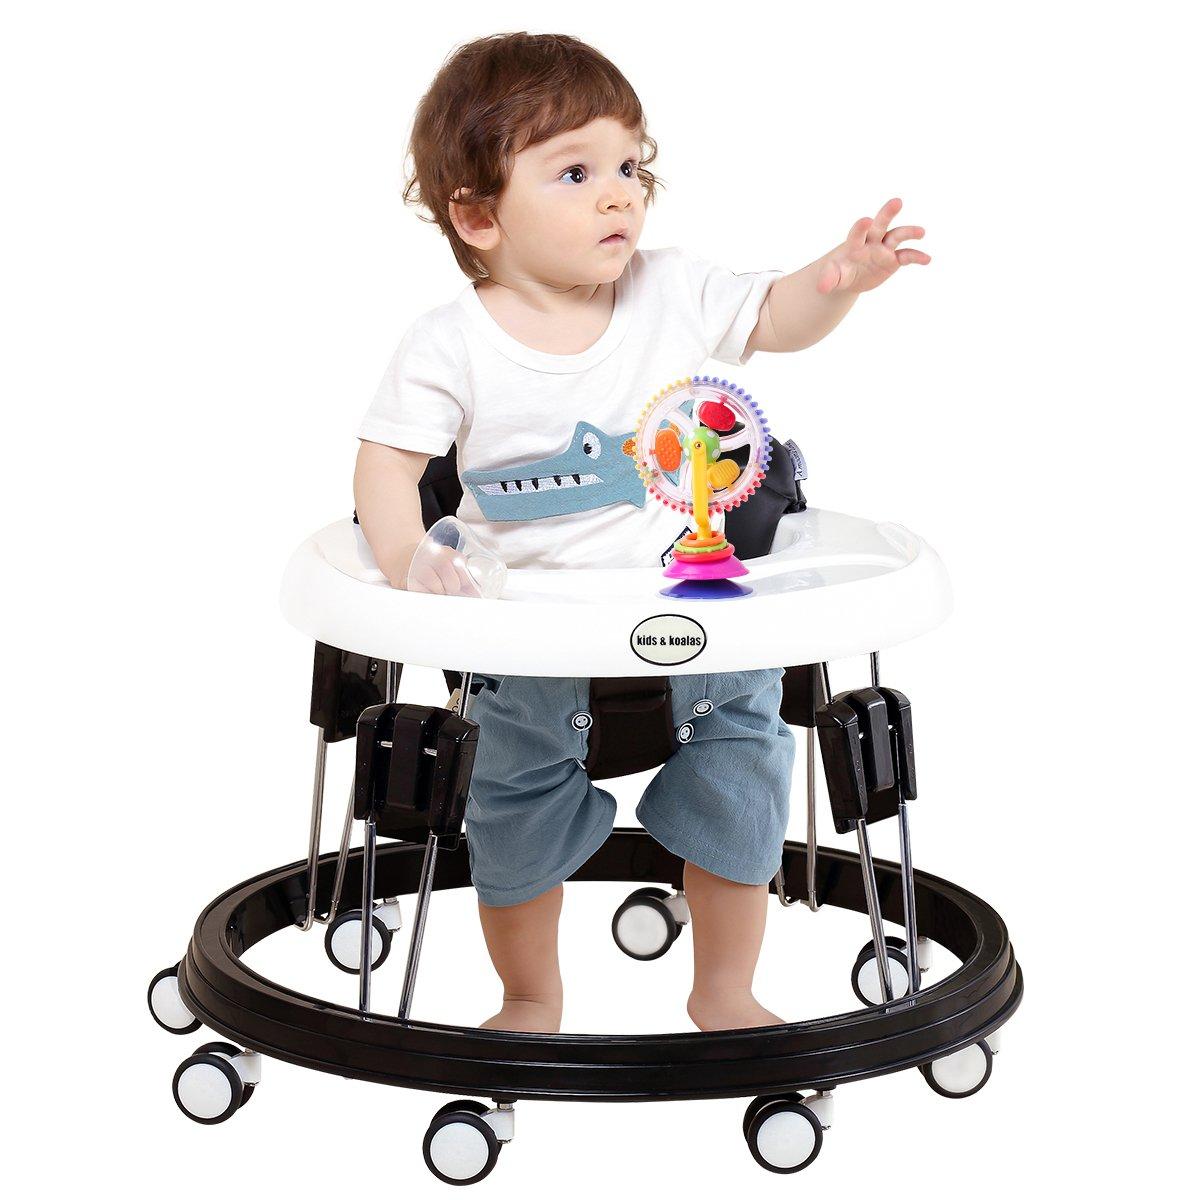 Kids&Koalas Foldable Baby Walker,Height Adjustable and Free Installation Learning Walker (Cloth Black)